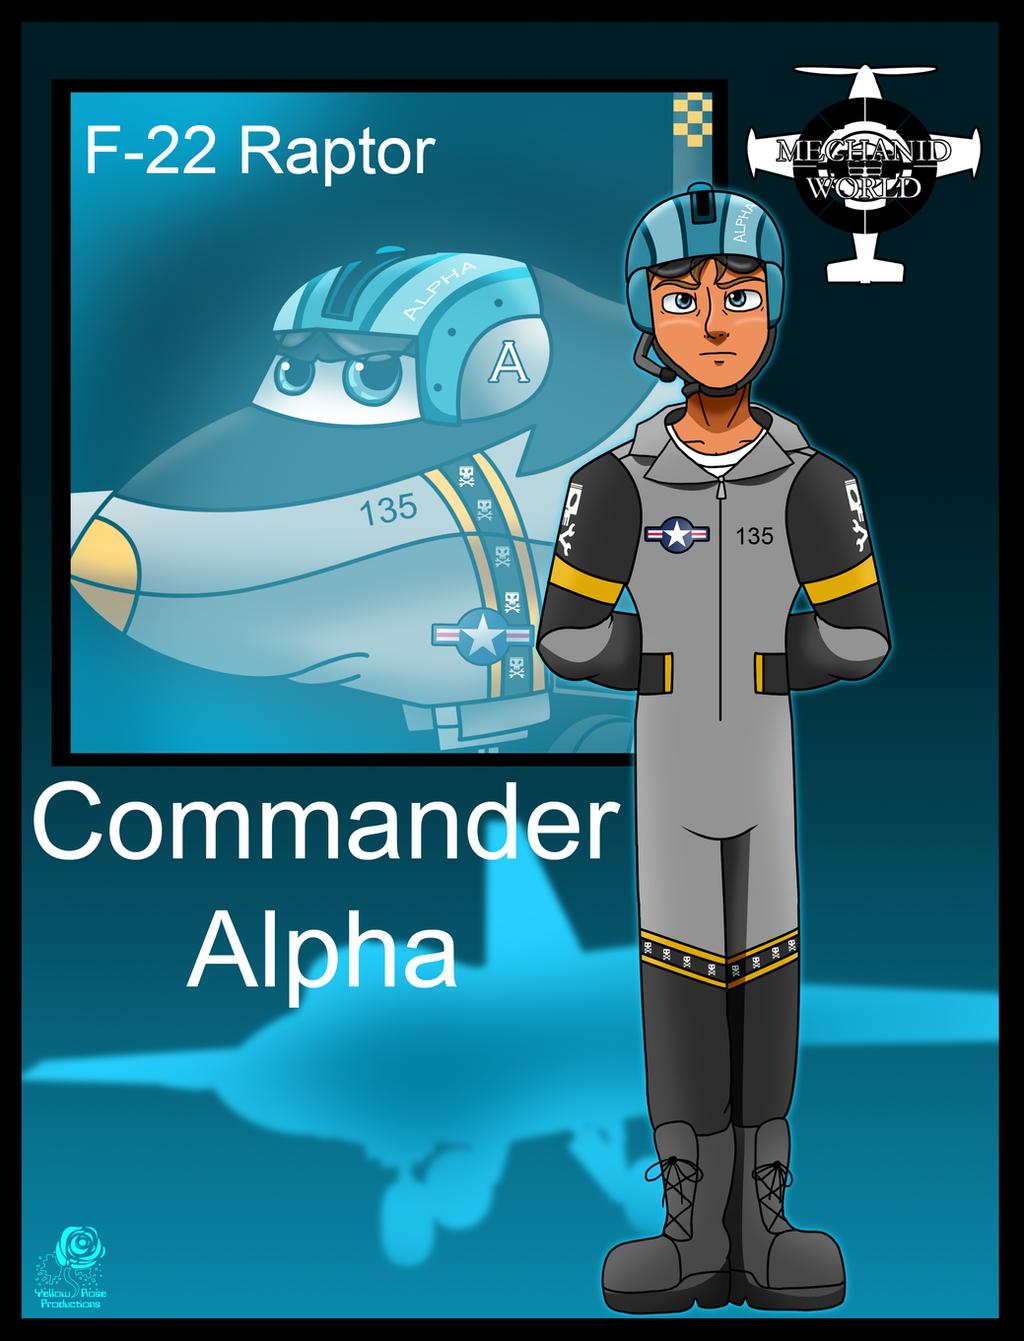 Mechanid world commander alpha by aileen rose on deviantart for Commander rose